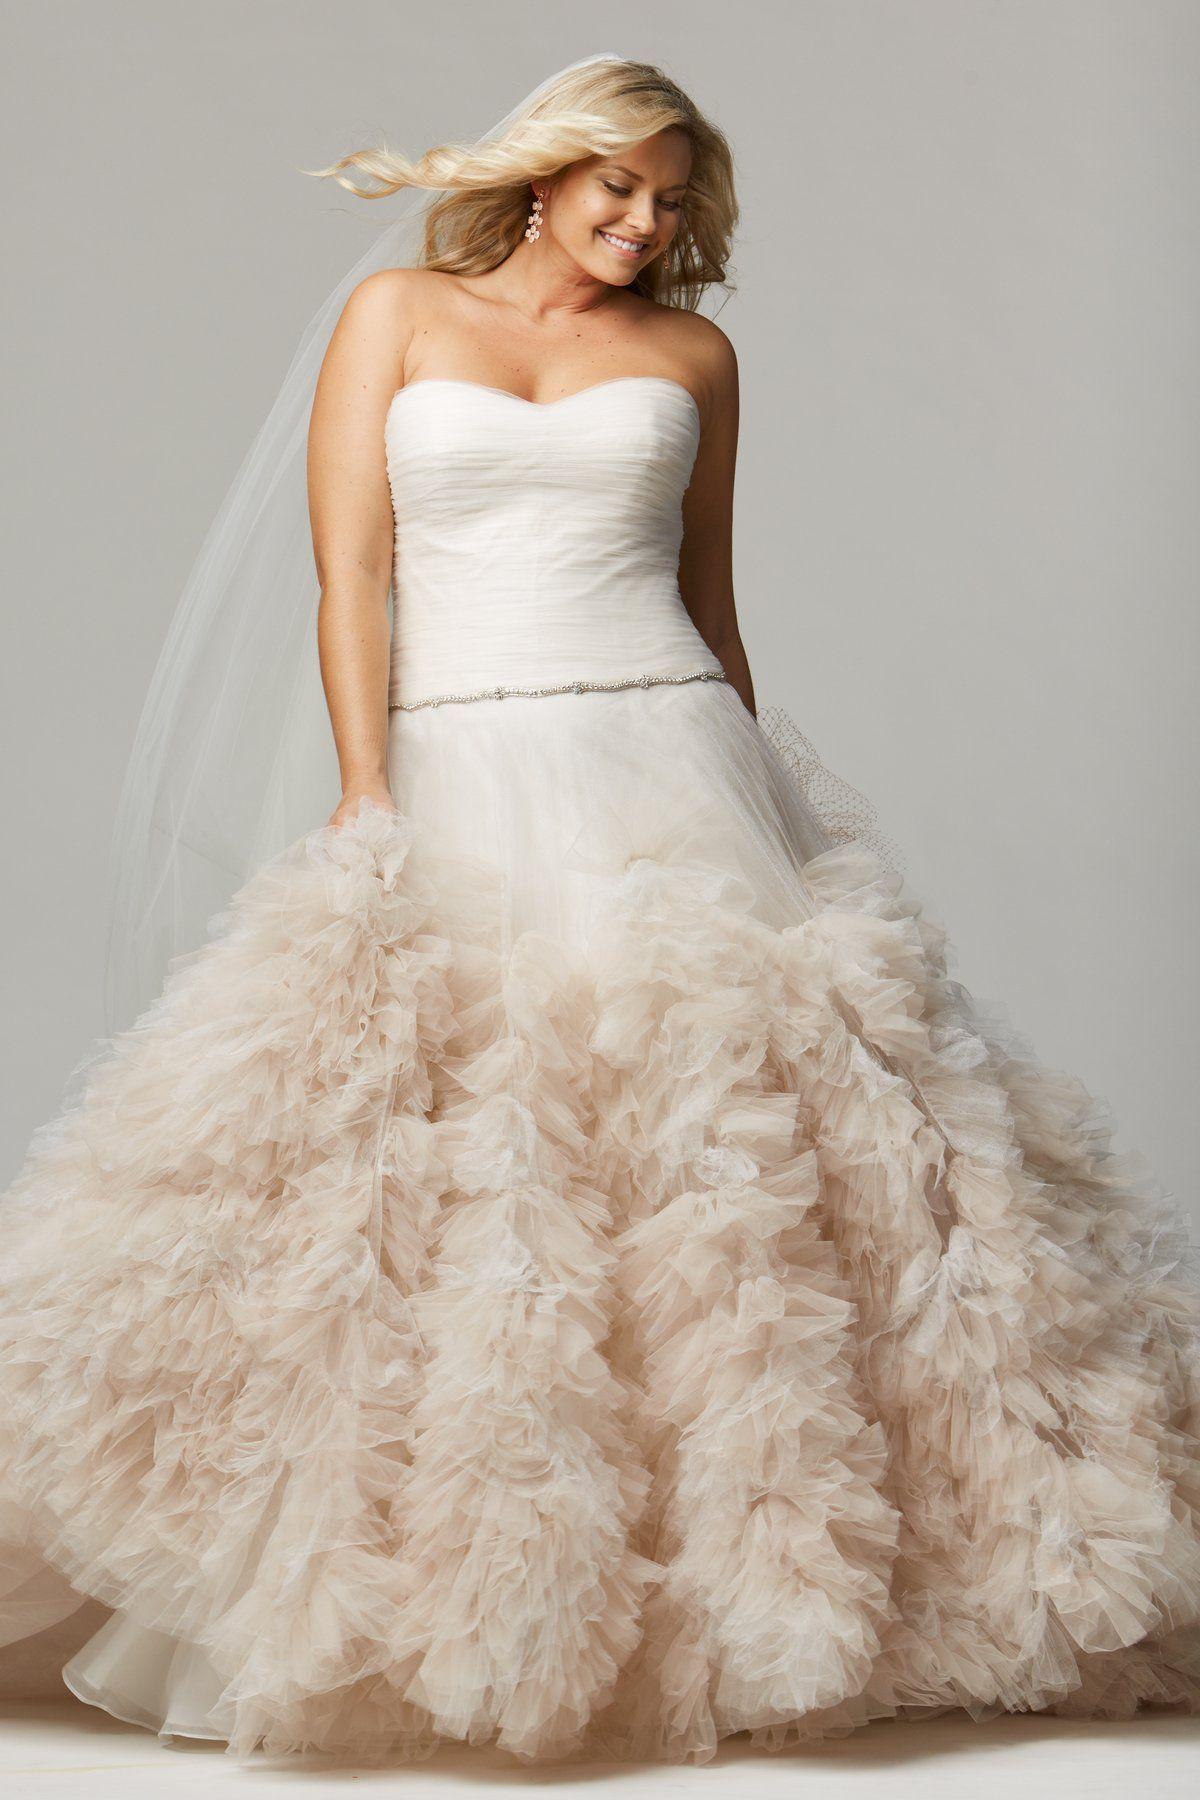 Wedding dresses for plus size brides  Wtoo Plus Size Wedding Dress  ALLEGRA  Wedding Dresses